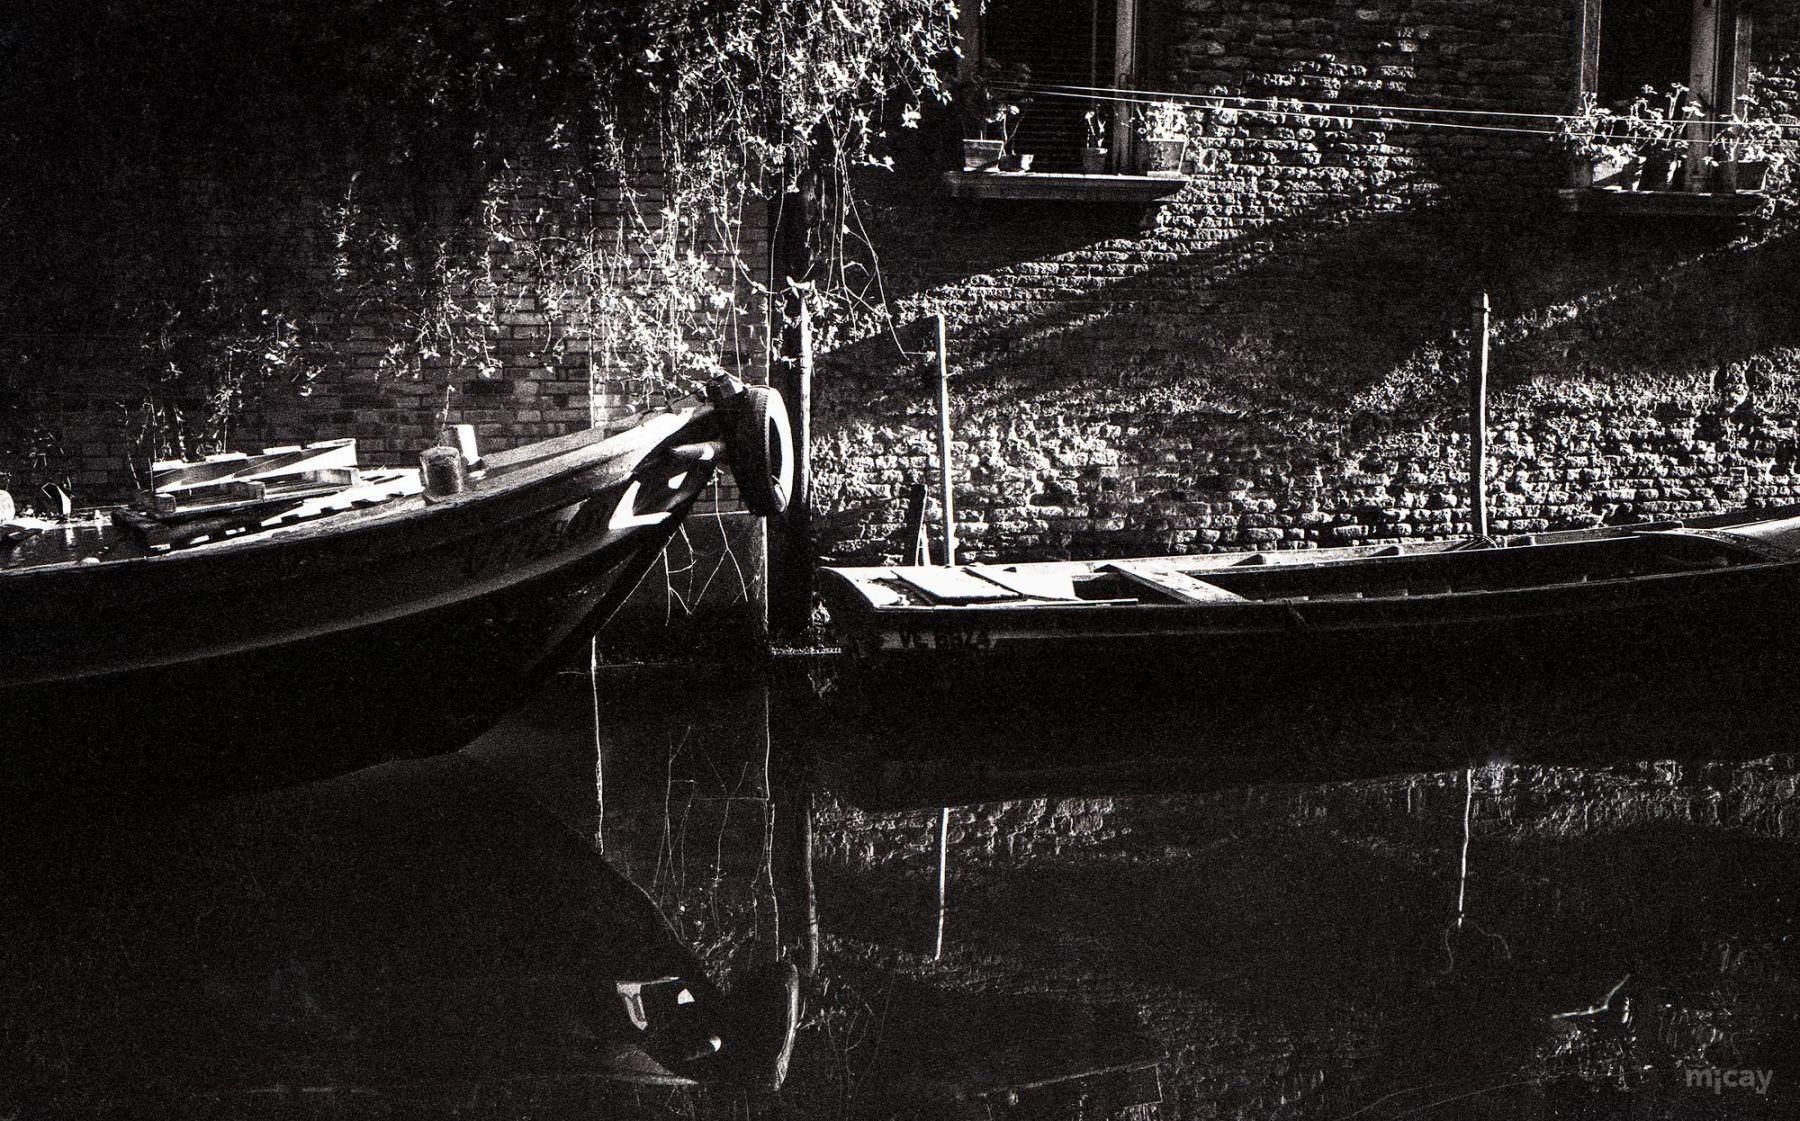 MichelAycaguer-Venise-AquaAlta-Noel-1981-38